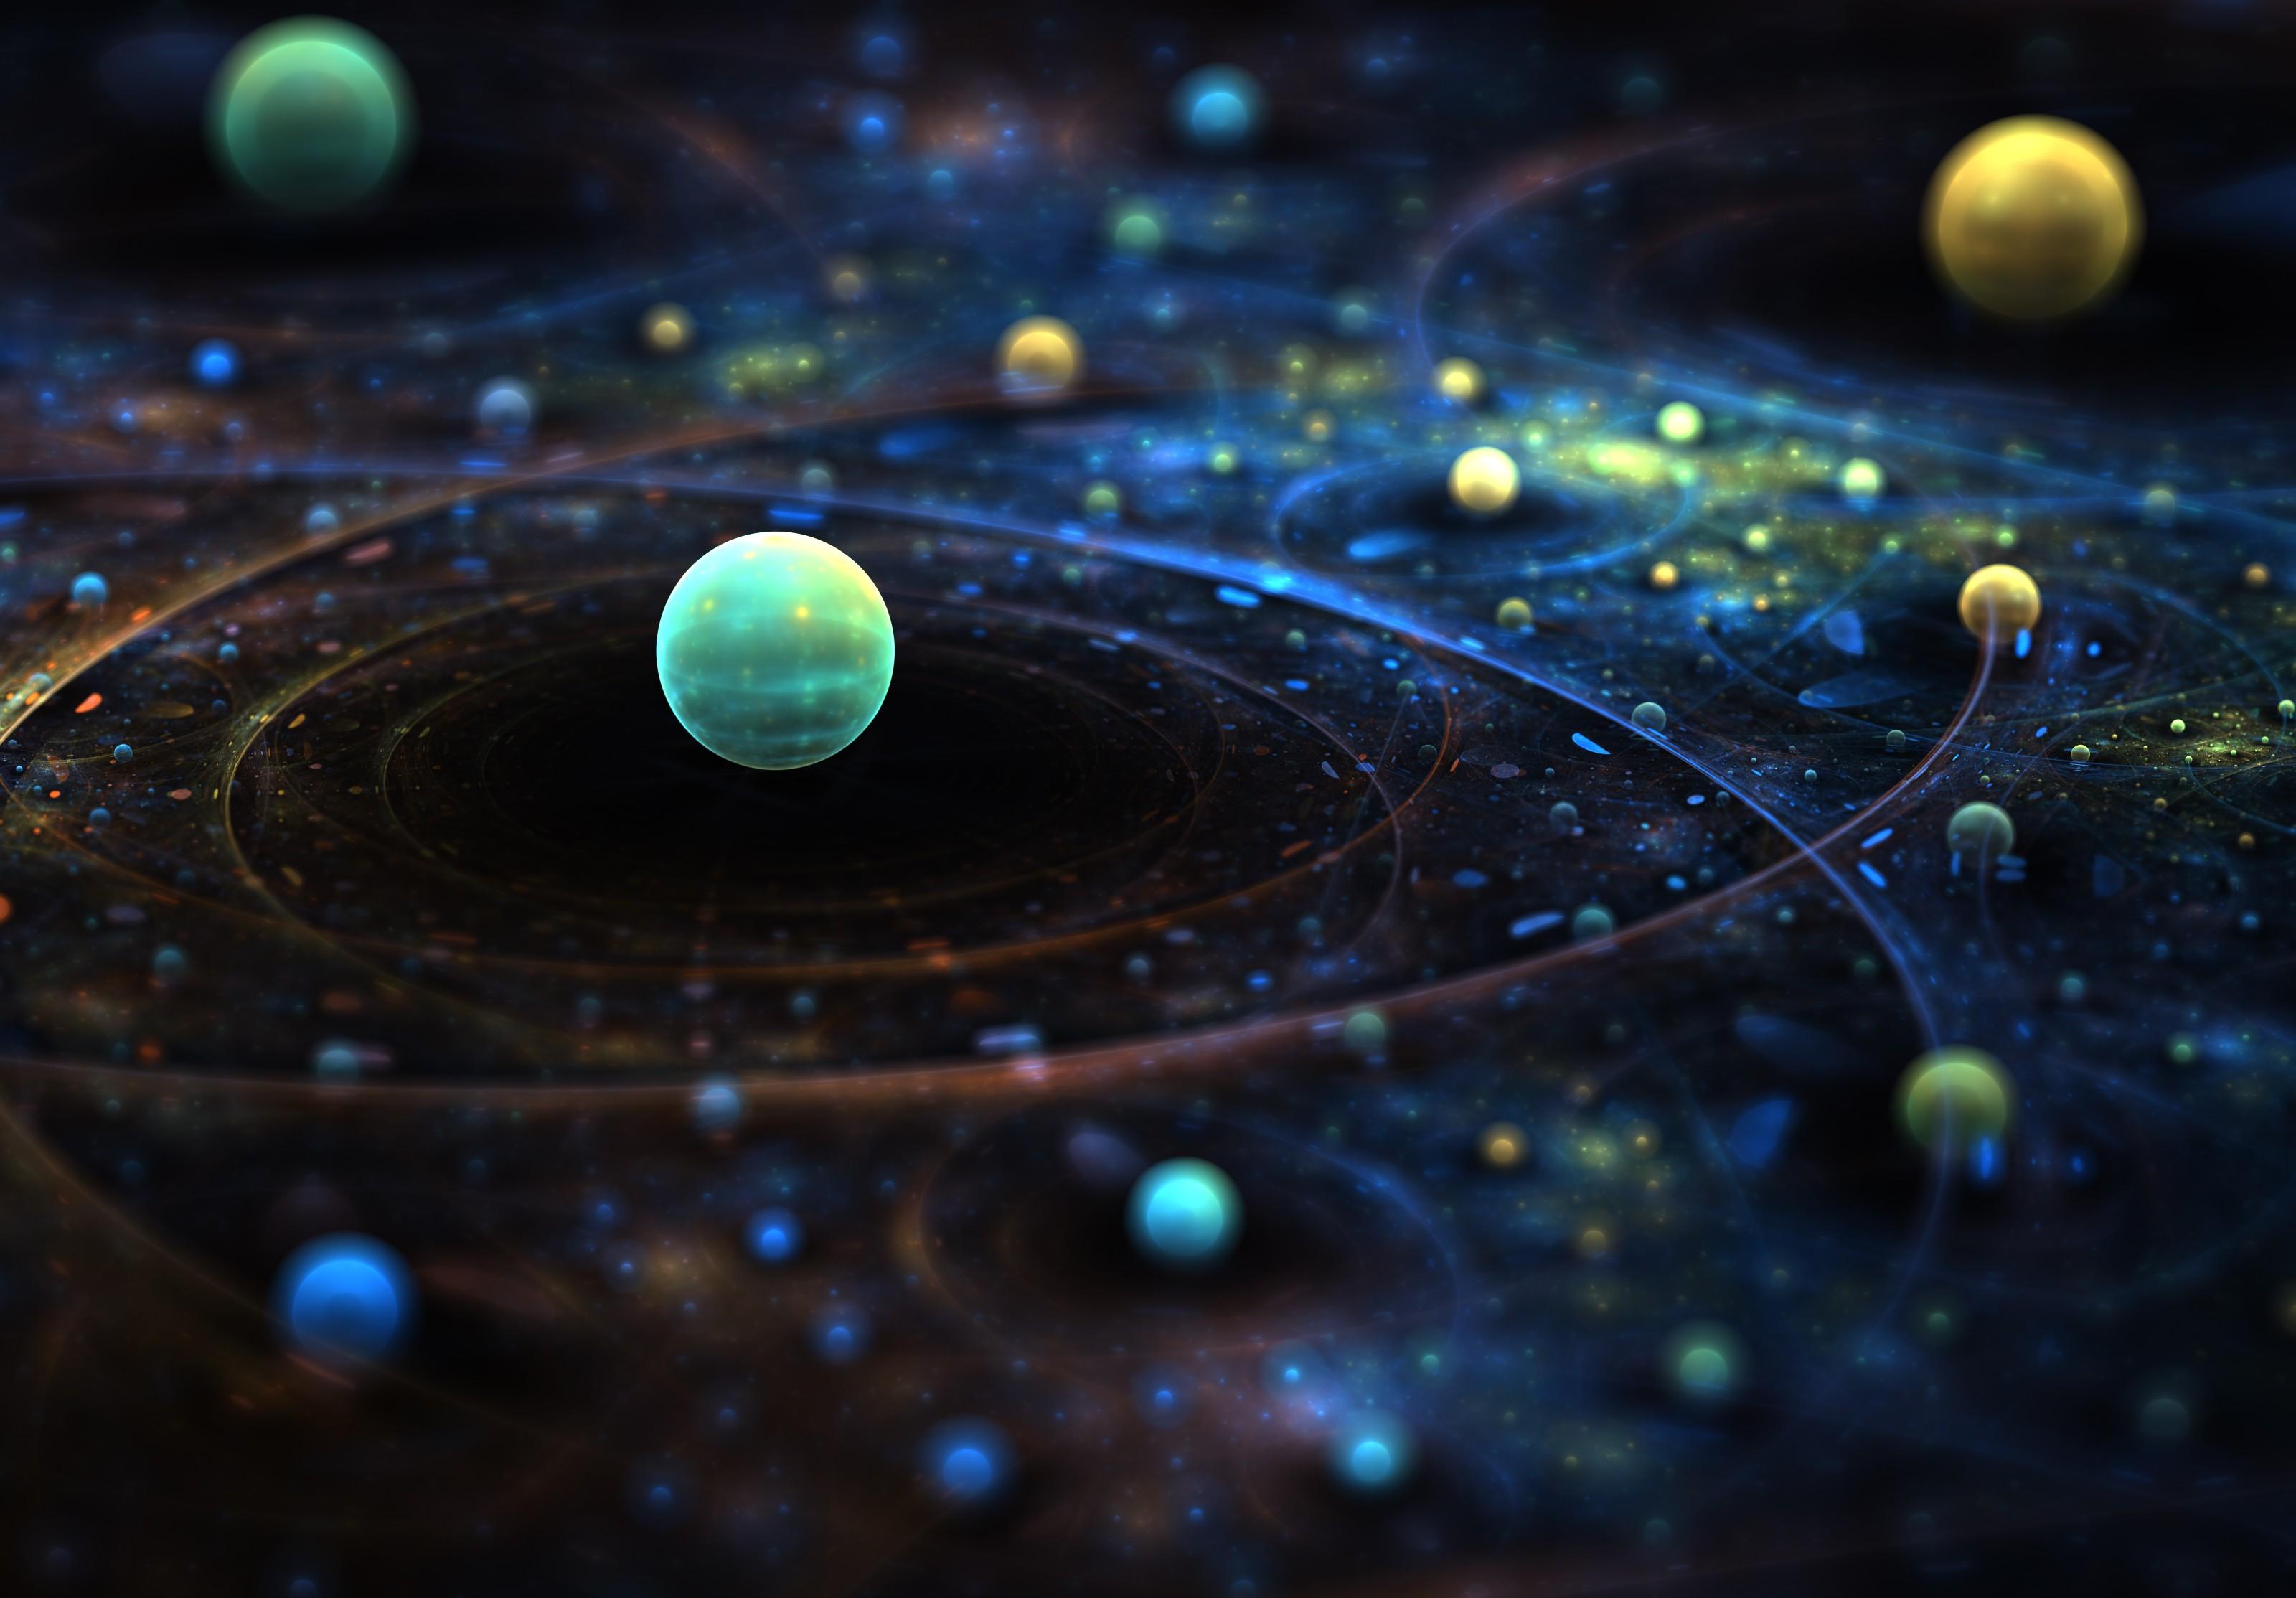 General 3200x2227 space universe digital art planet abstract sphere space art 3D Abstract 3D map tilt shift